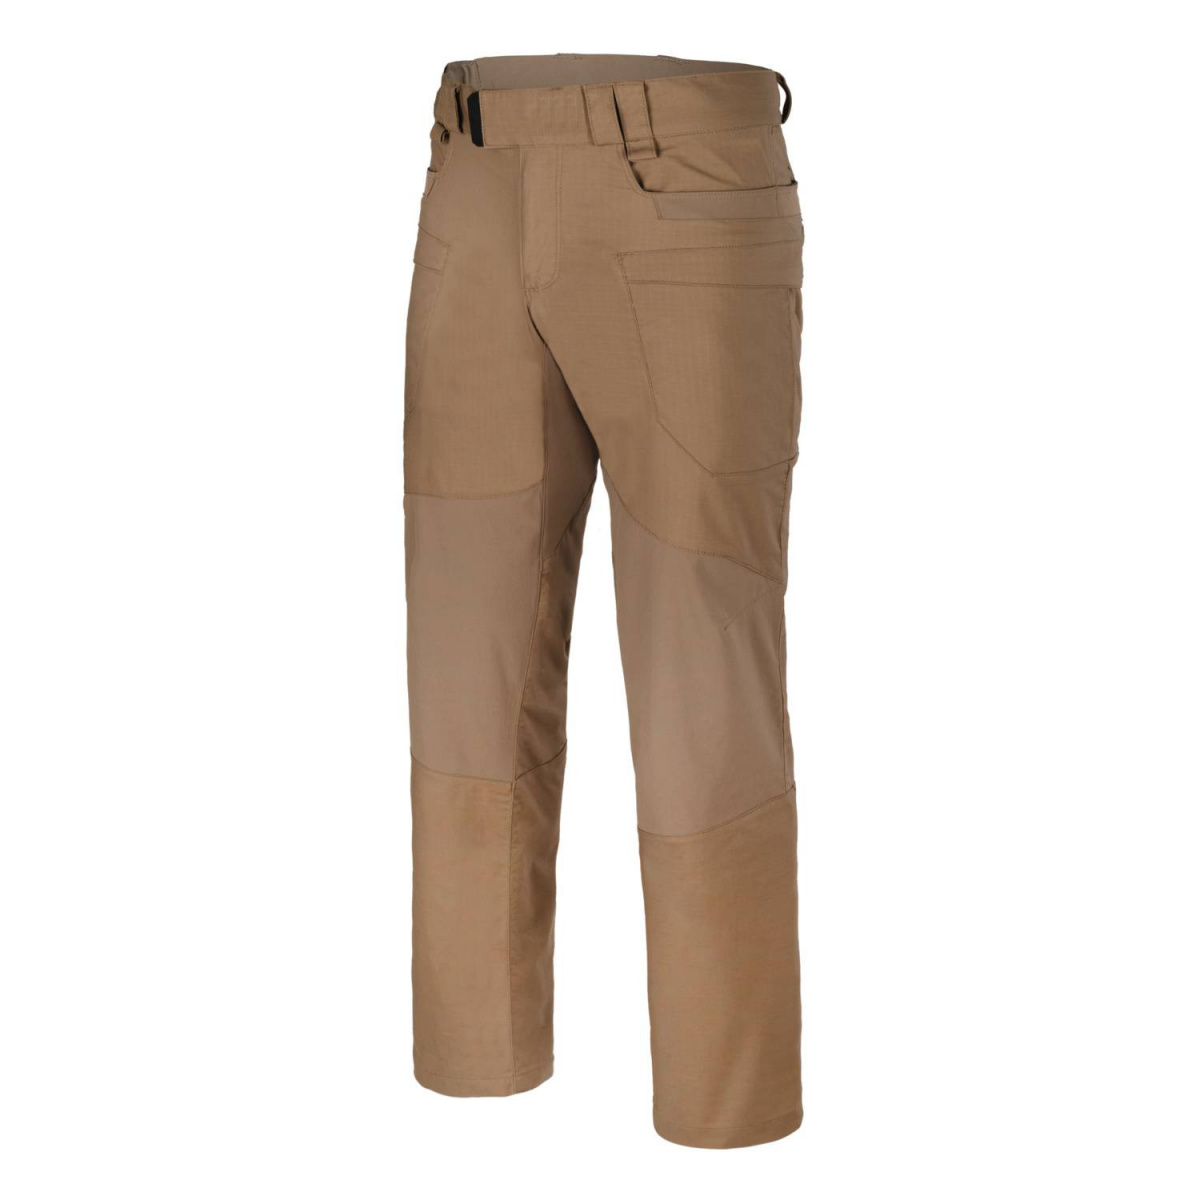 Kalhoty HYBRID TACTICAL MUD BROWN - zvìtšit obrázek